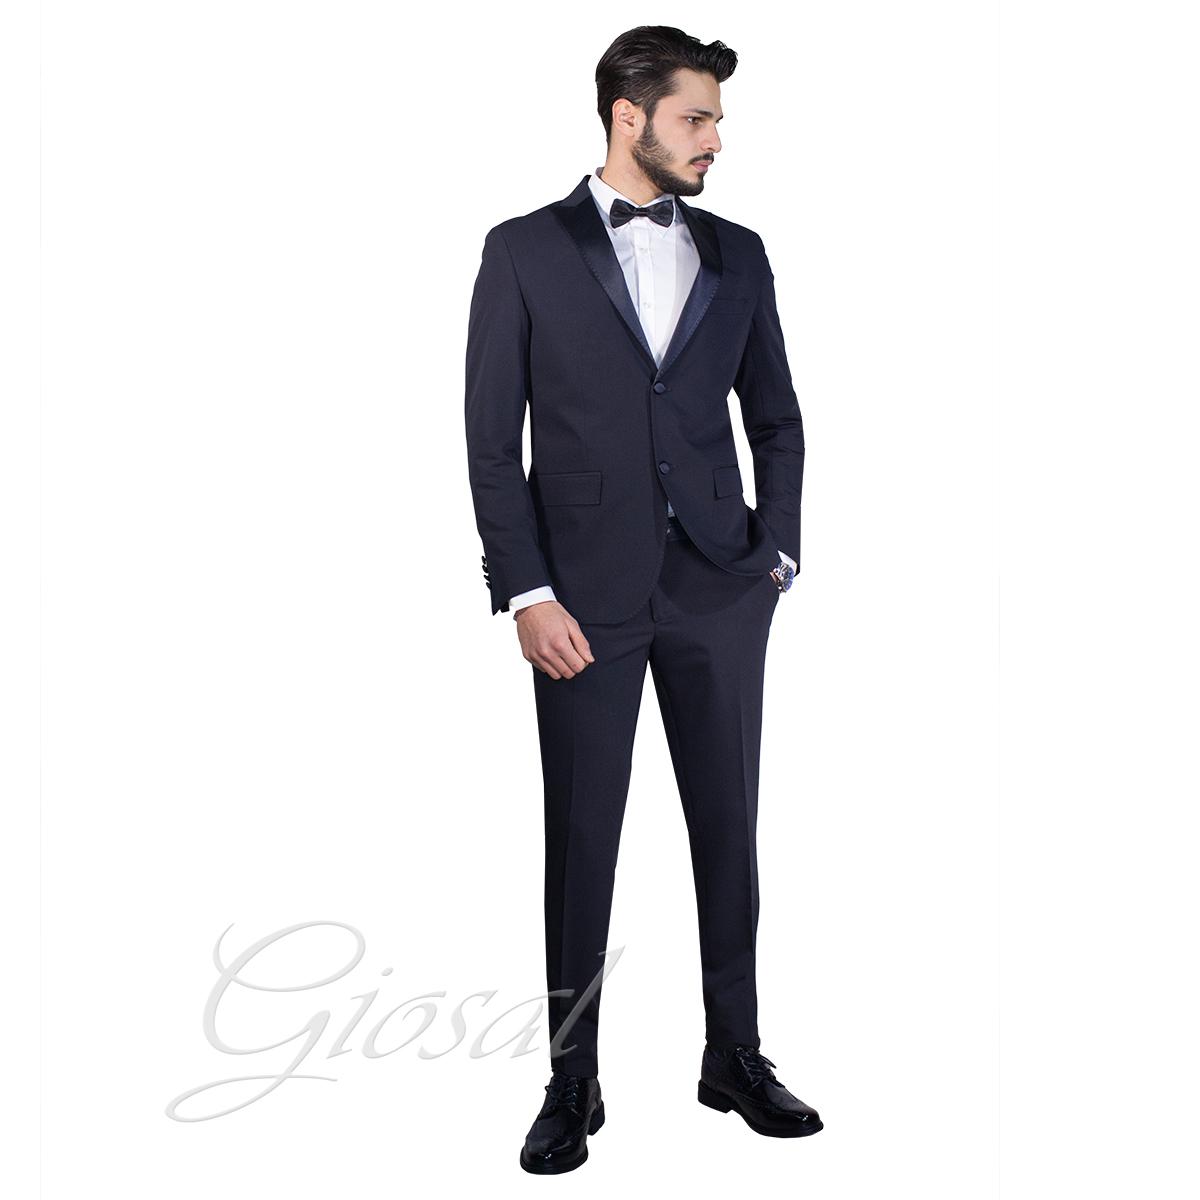 d3528e994cba Abito Elegante Uomo Vestito Giacca Pantalone Smoking Raso Bottoni Blu Suits  G... - AE1001A